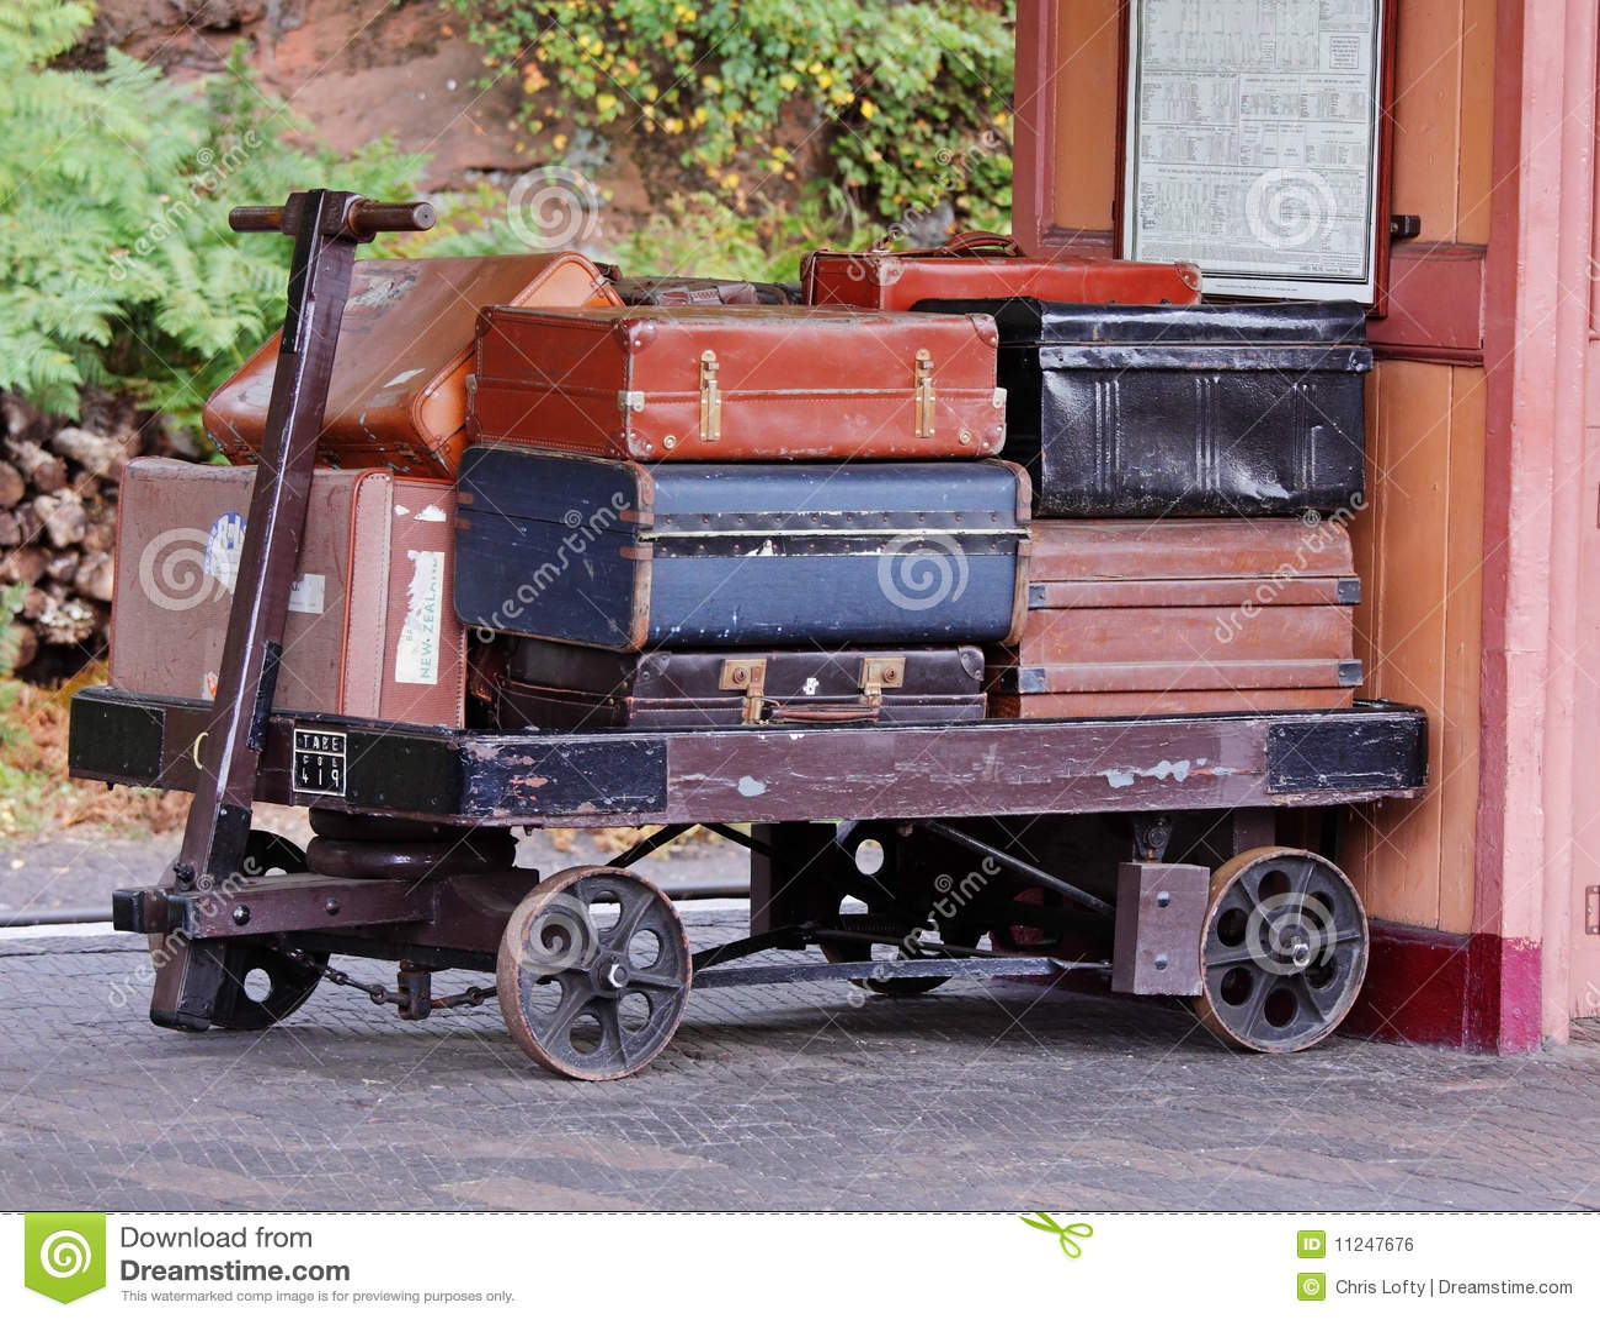 Vintage Luggage On A Railway Station Platform